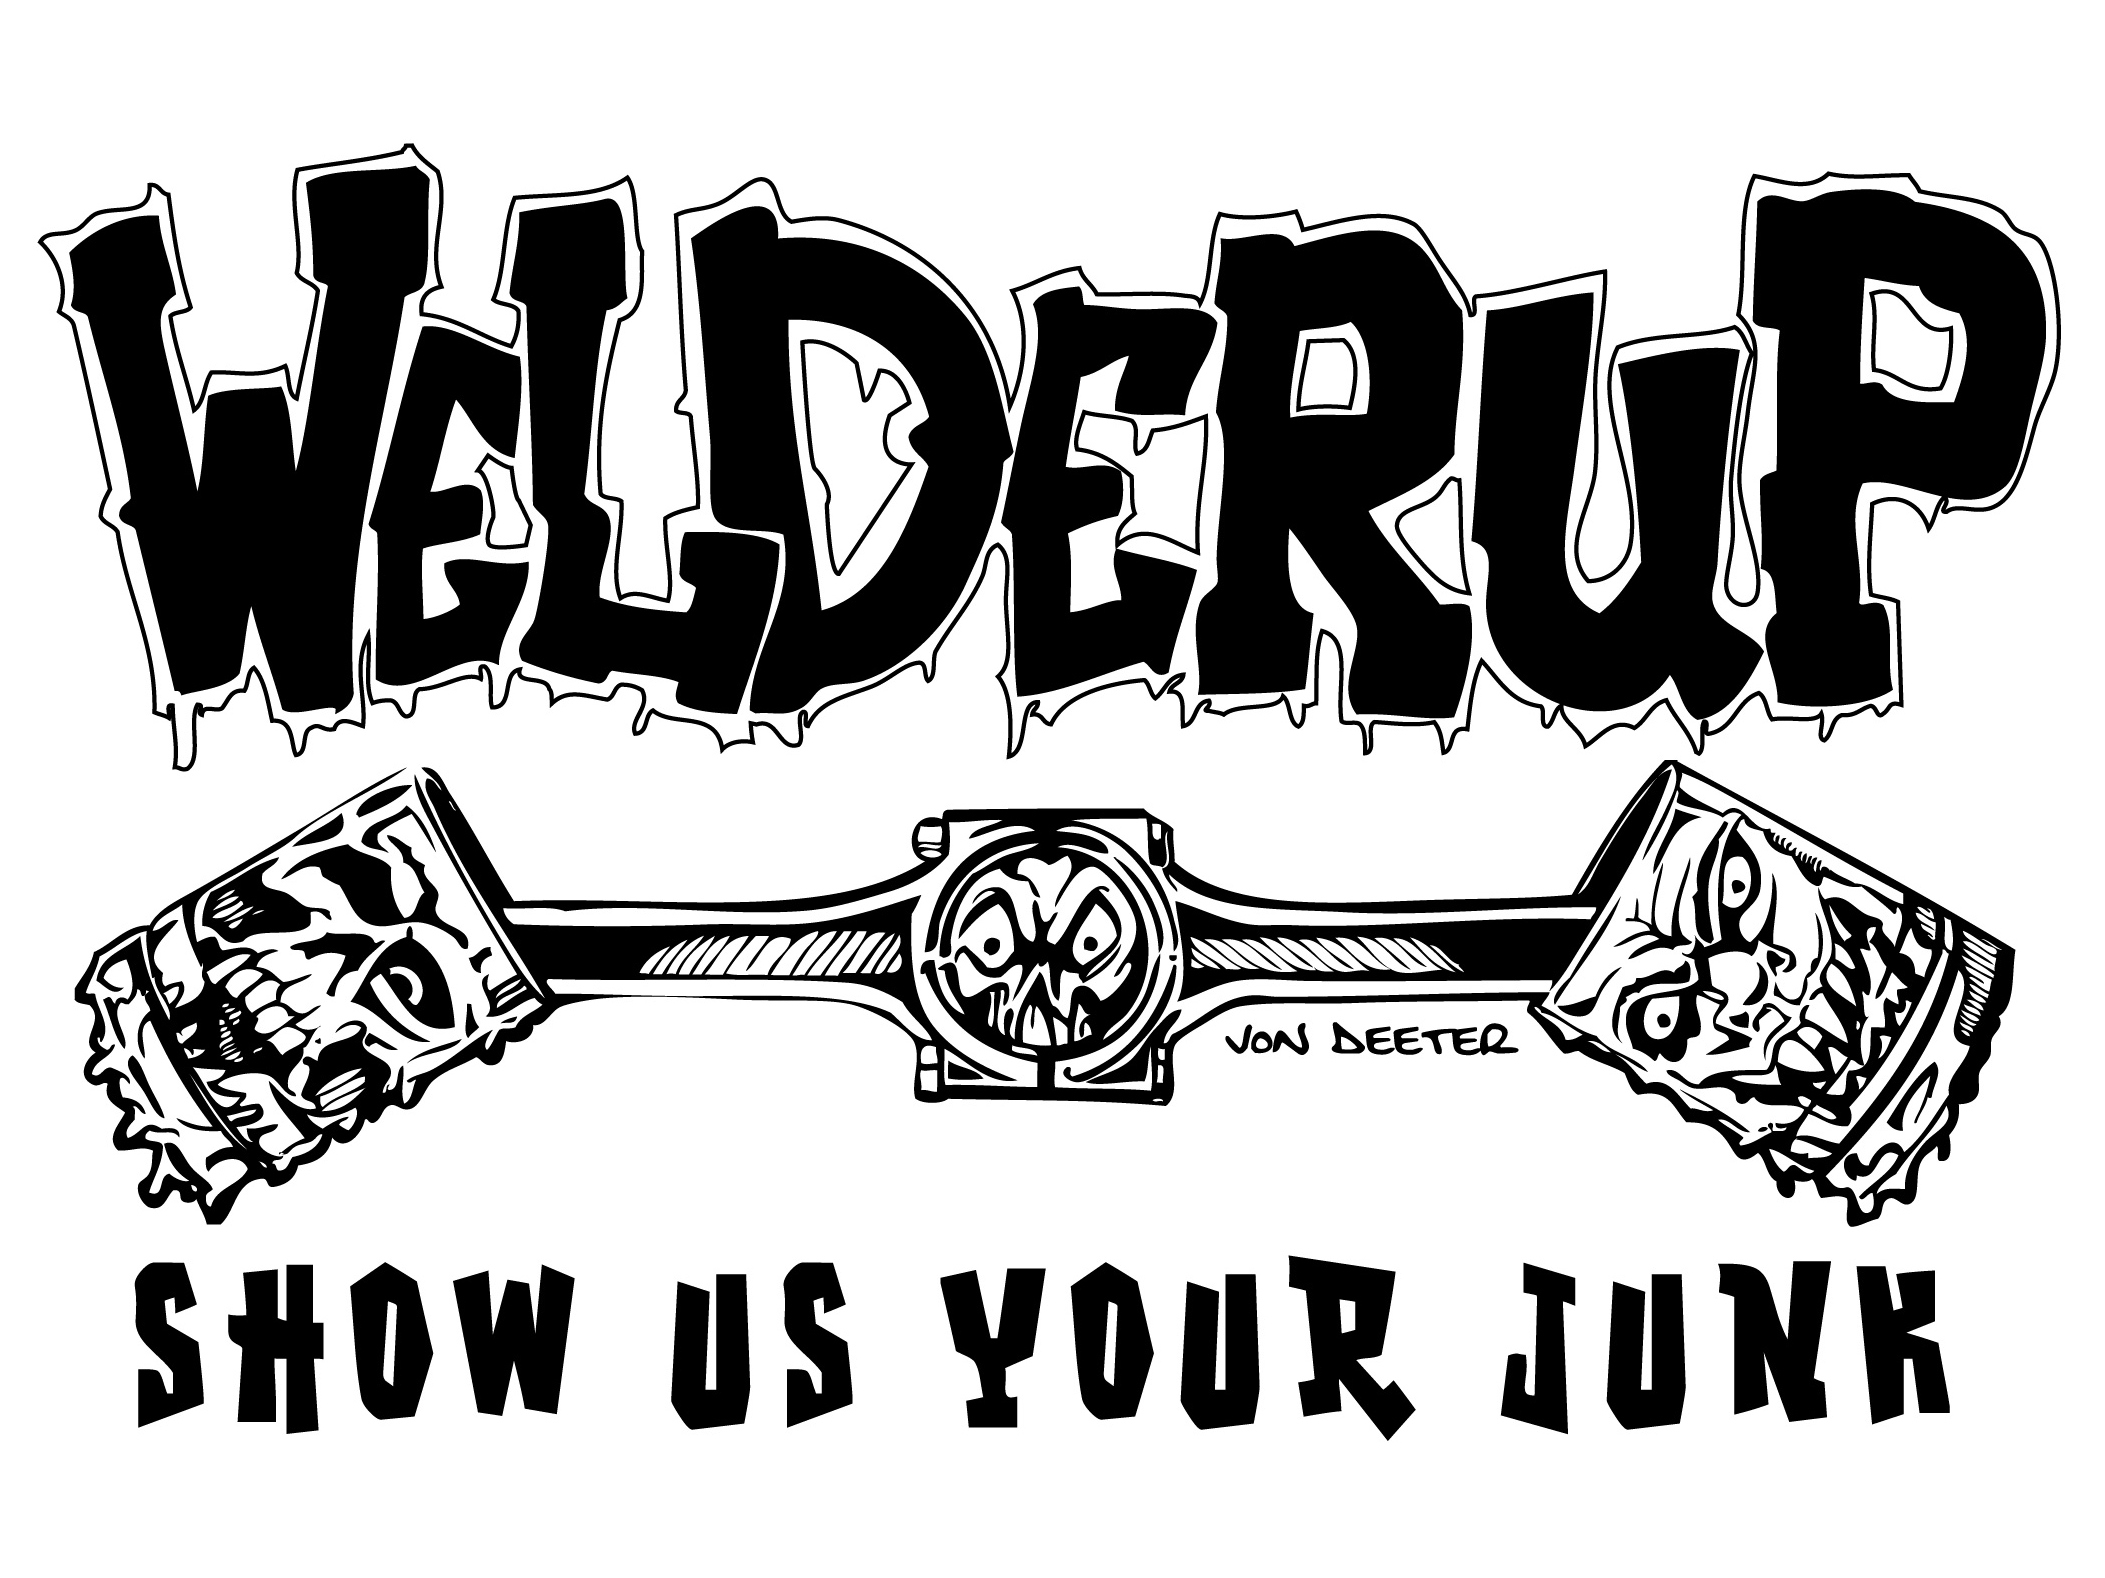 welderup-logo-bw-01.jpg